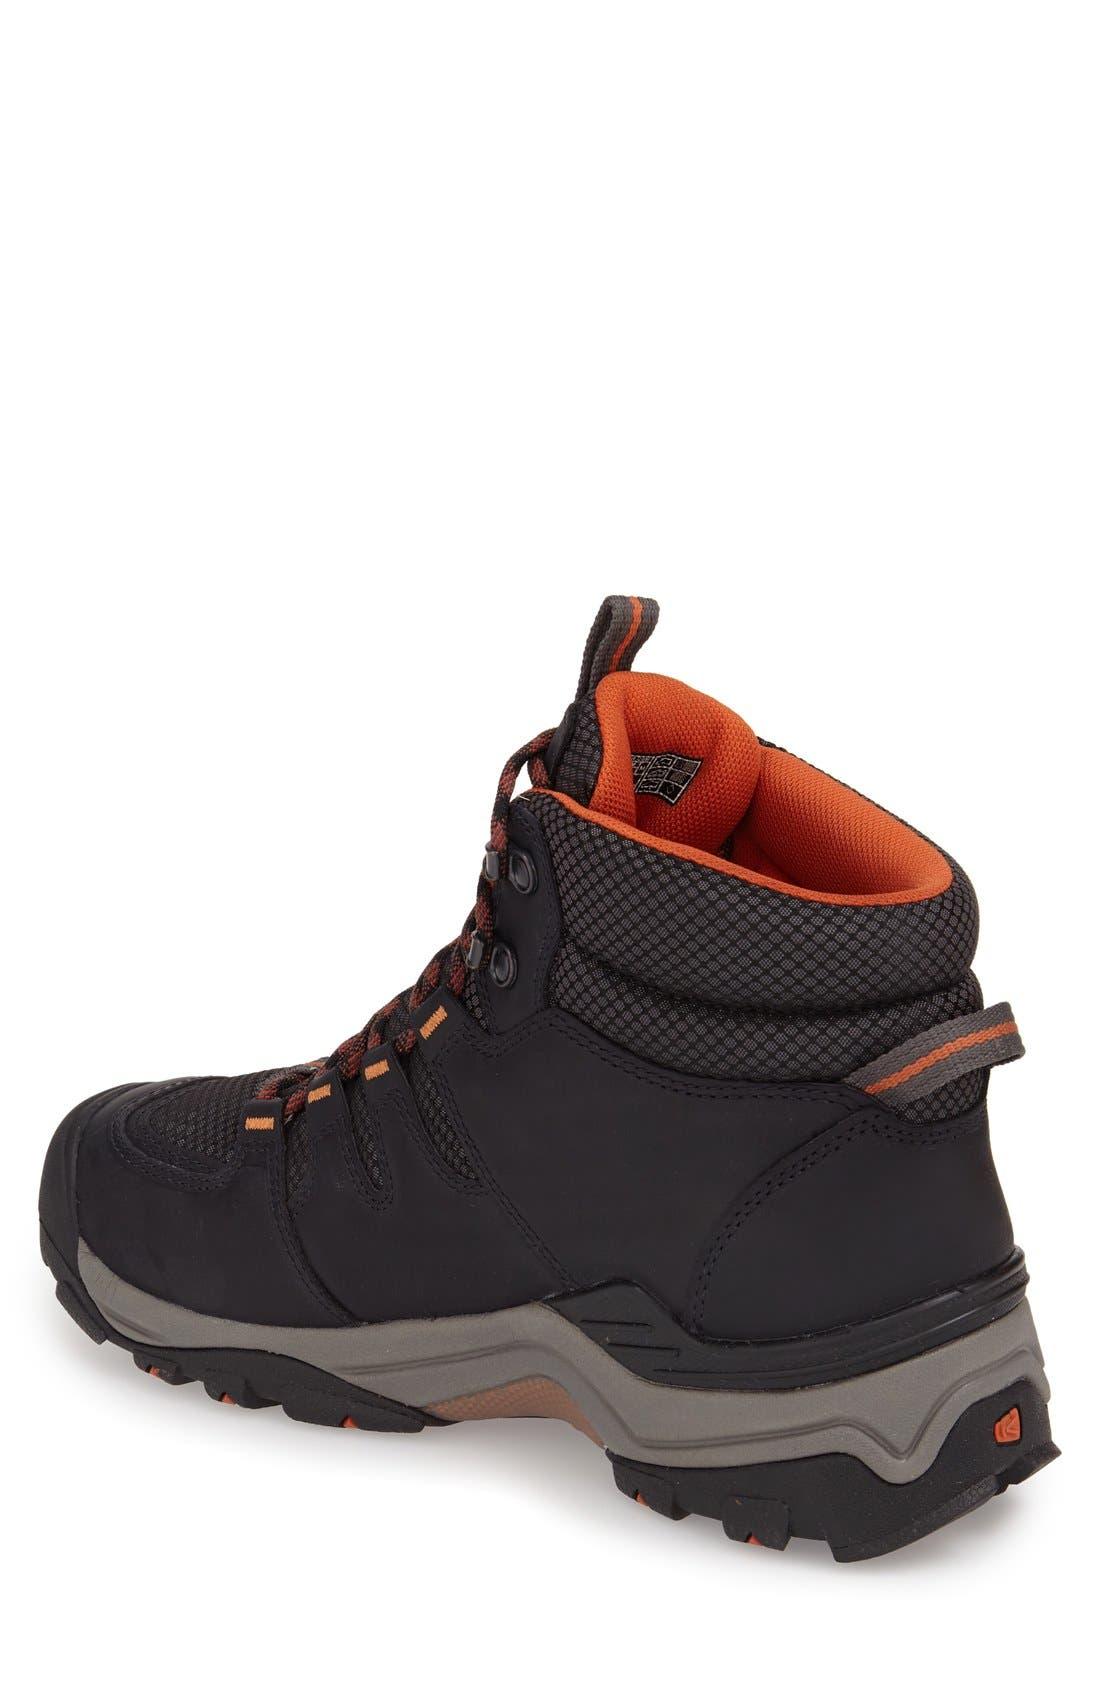 Gypsum II Waterproof Hiking Boot,                             Alternate thumbnail 2, color,                             BLACK NUBUCK LEATHER